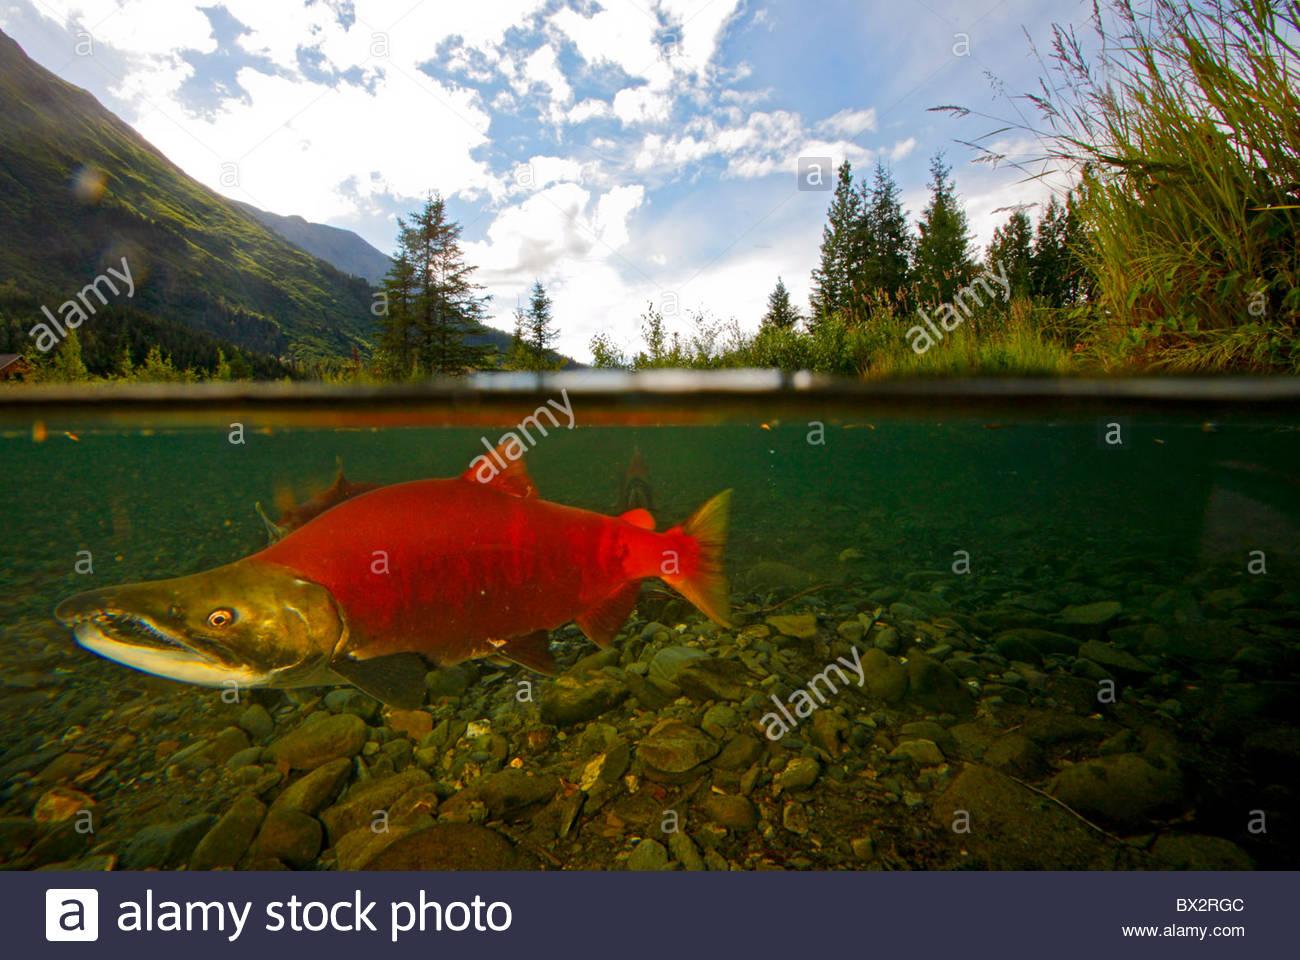 Spawning Red Salmon, Tern Lake, Kenai Peninsula, Chugach National Forest, Alaska. - Stock Image